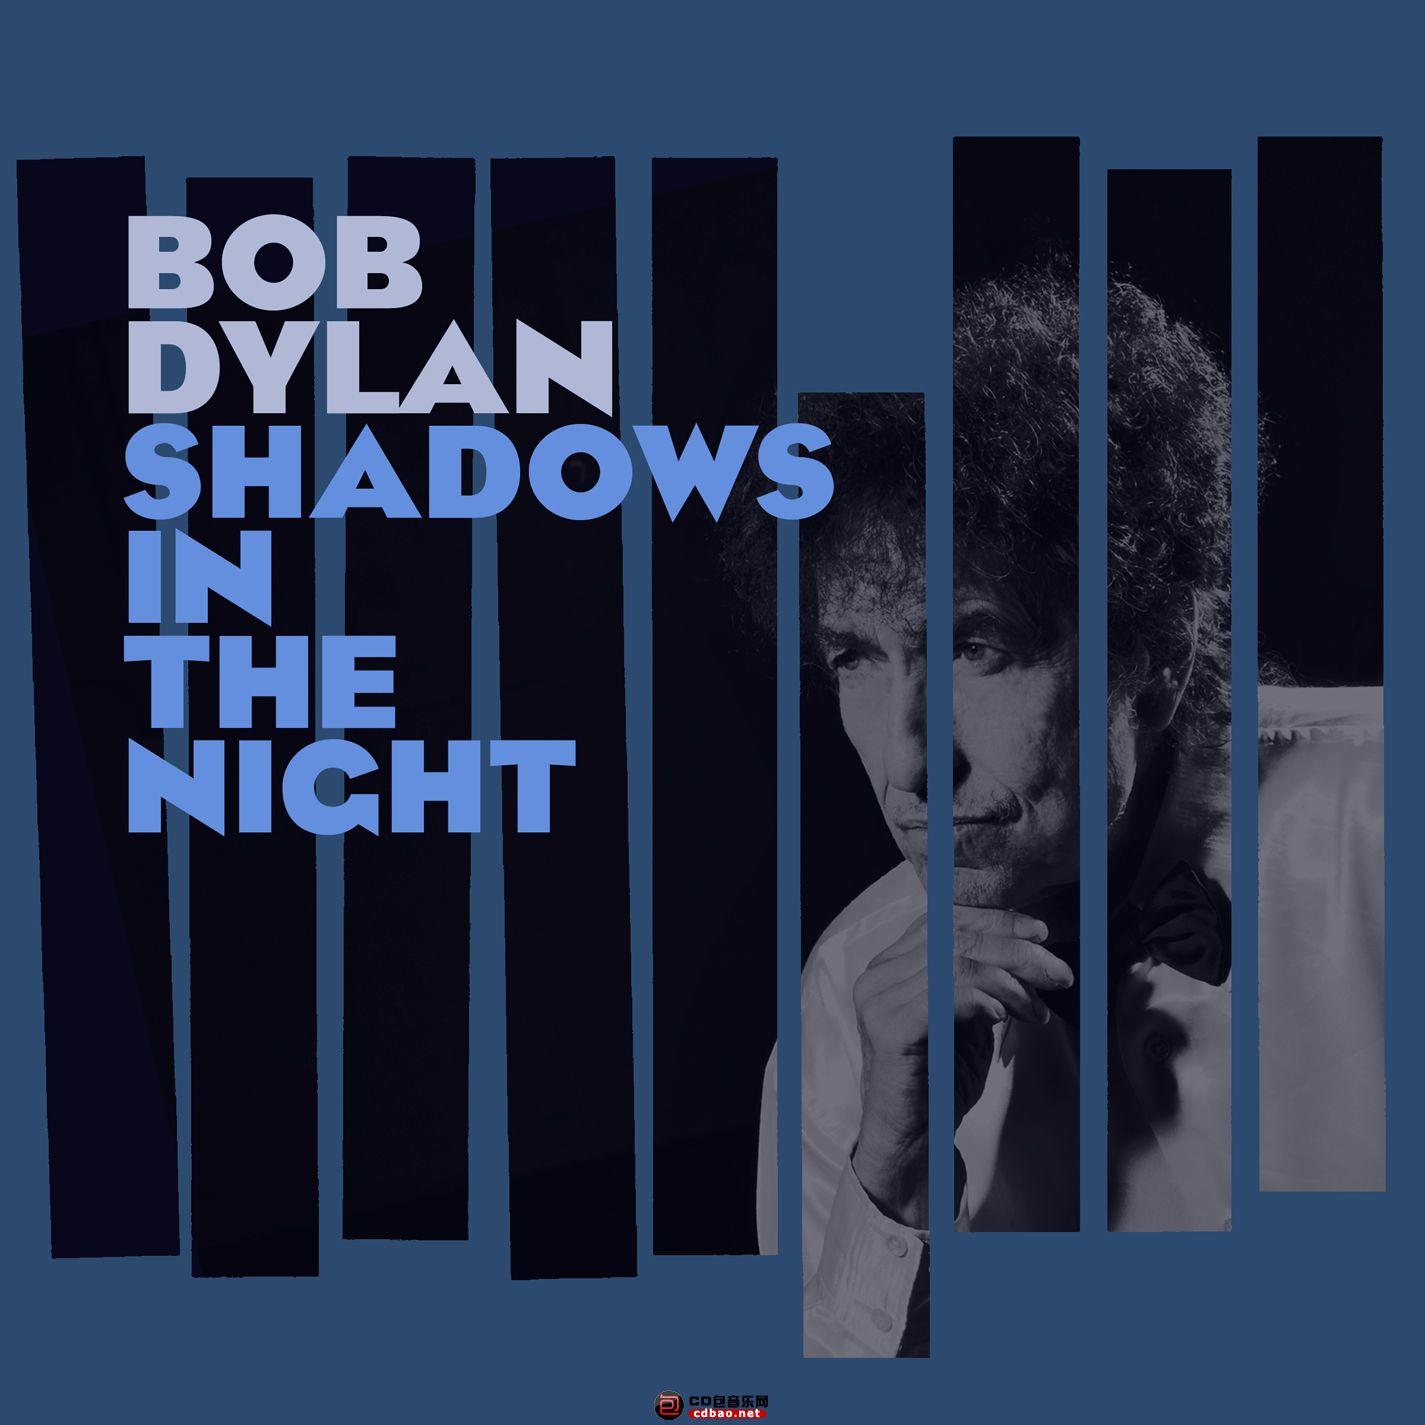 bob_dylan-shadows_in_the_night.jpg